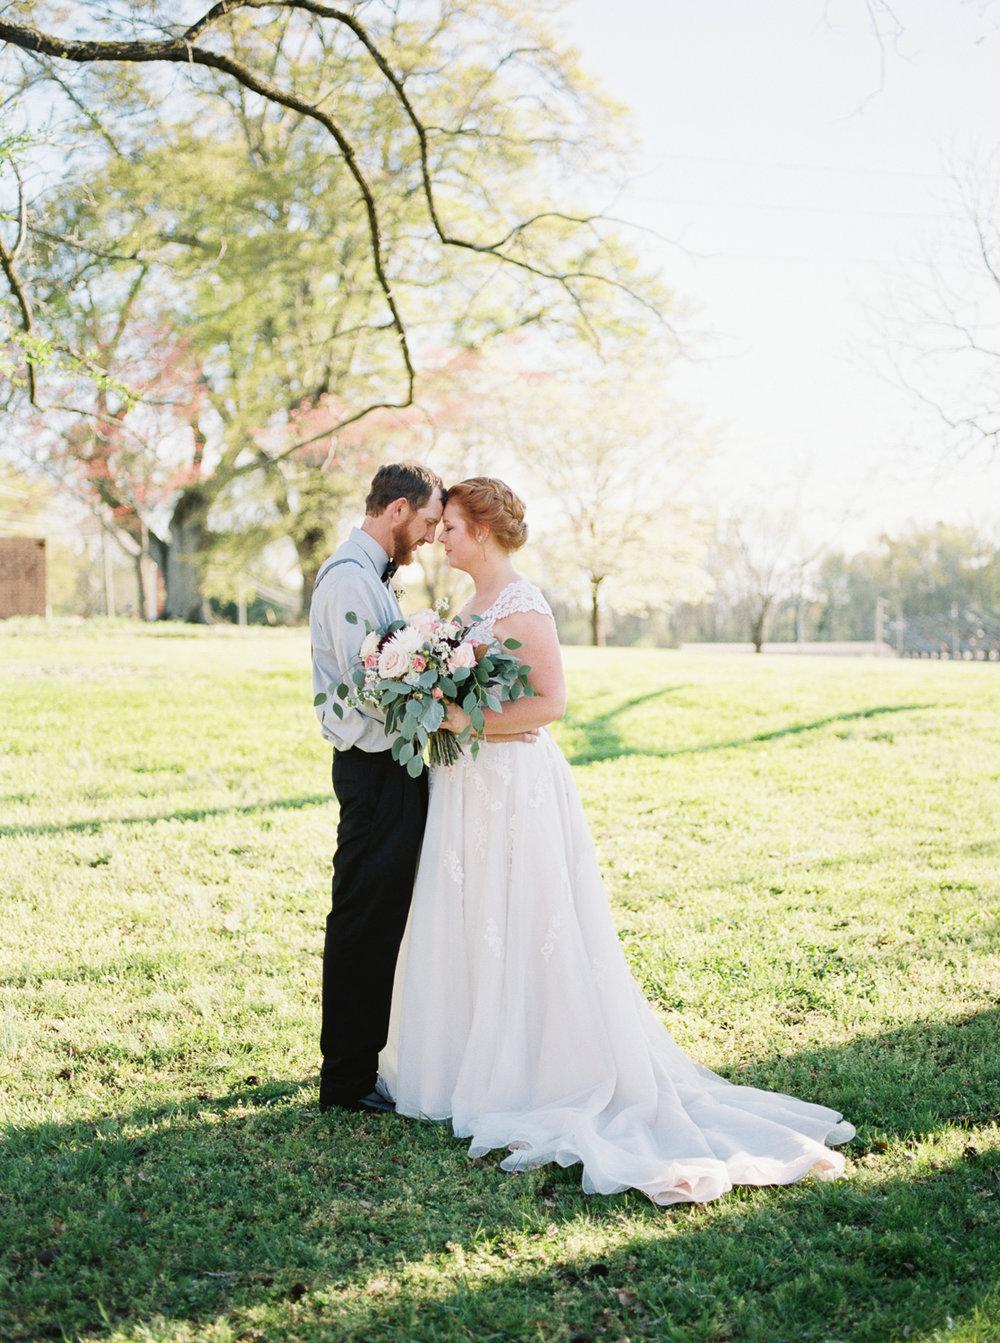 christinadavisphotography+realwedding+aprilfirst02.jpg